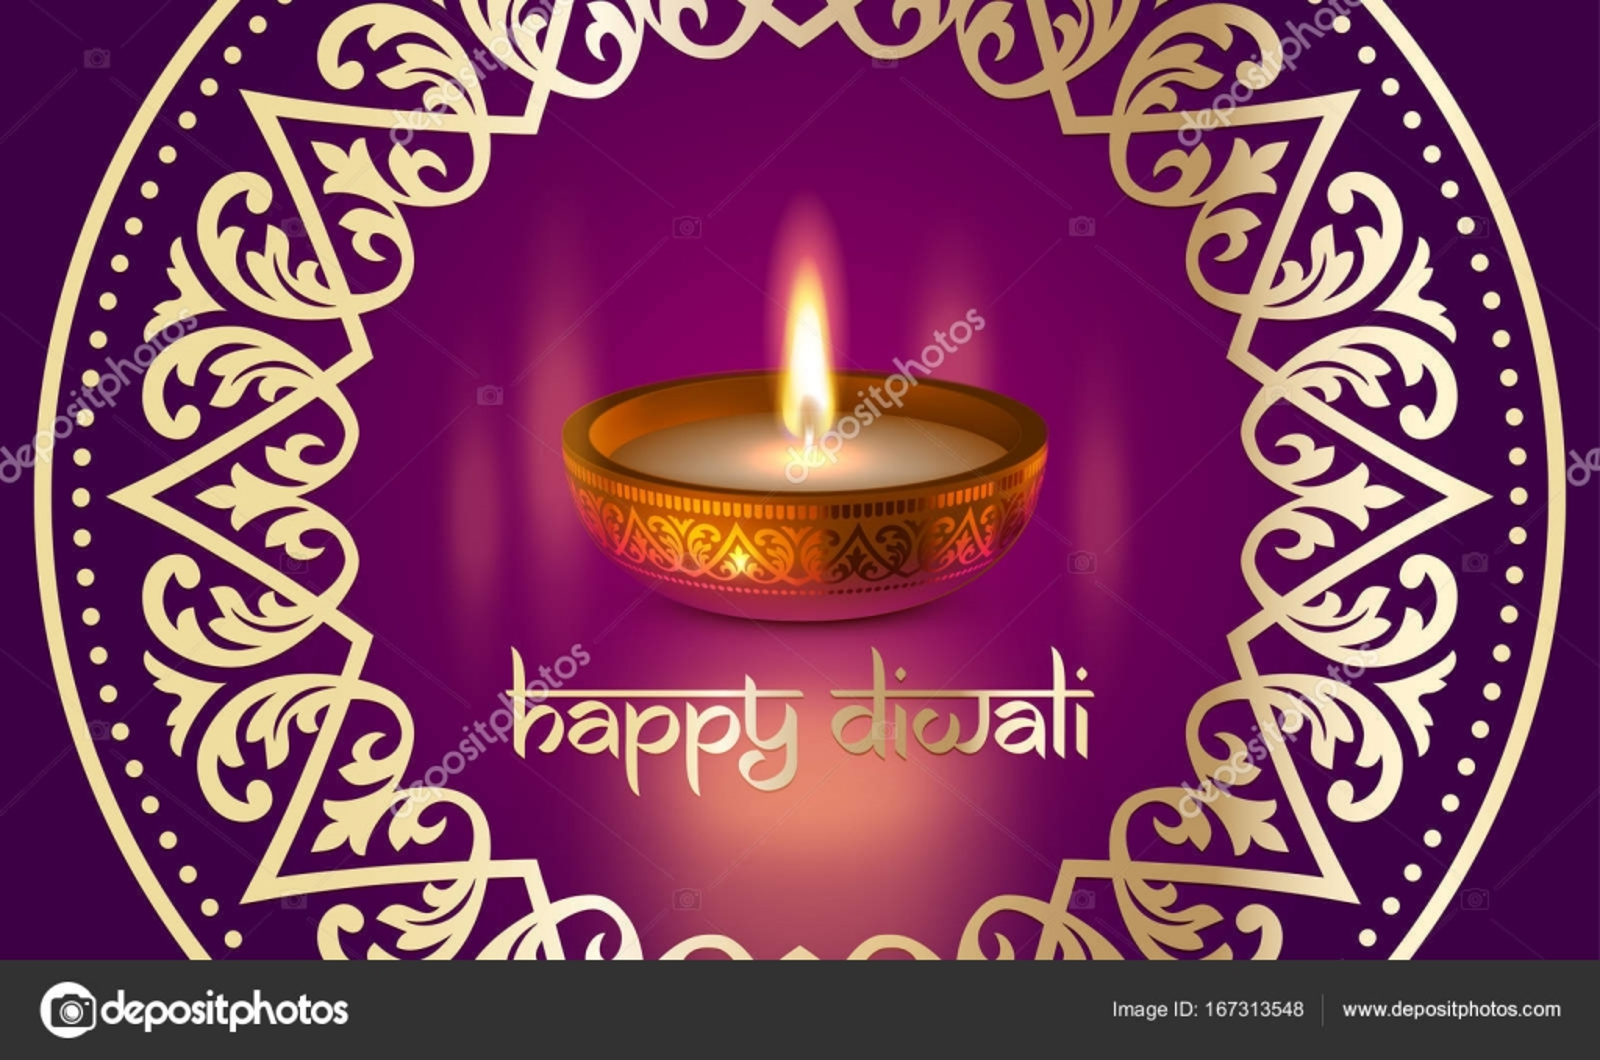 Happy diwali gold candle light indian festival greeting card vector happy diwali indian lights festival holiday traditional greeting card design of candle light flame lamp in golden bowl hindu ornament and diwali sanskrit m4hsunfo